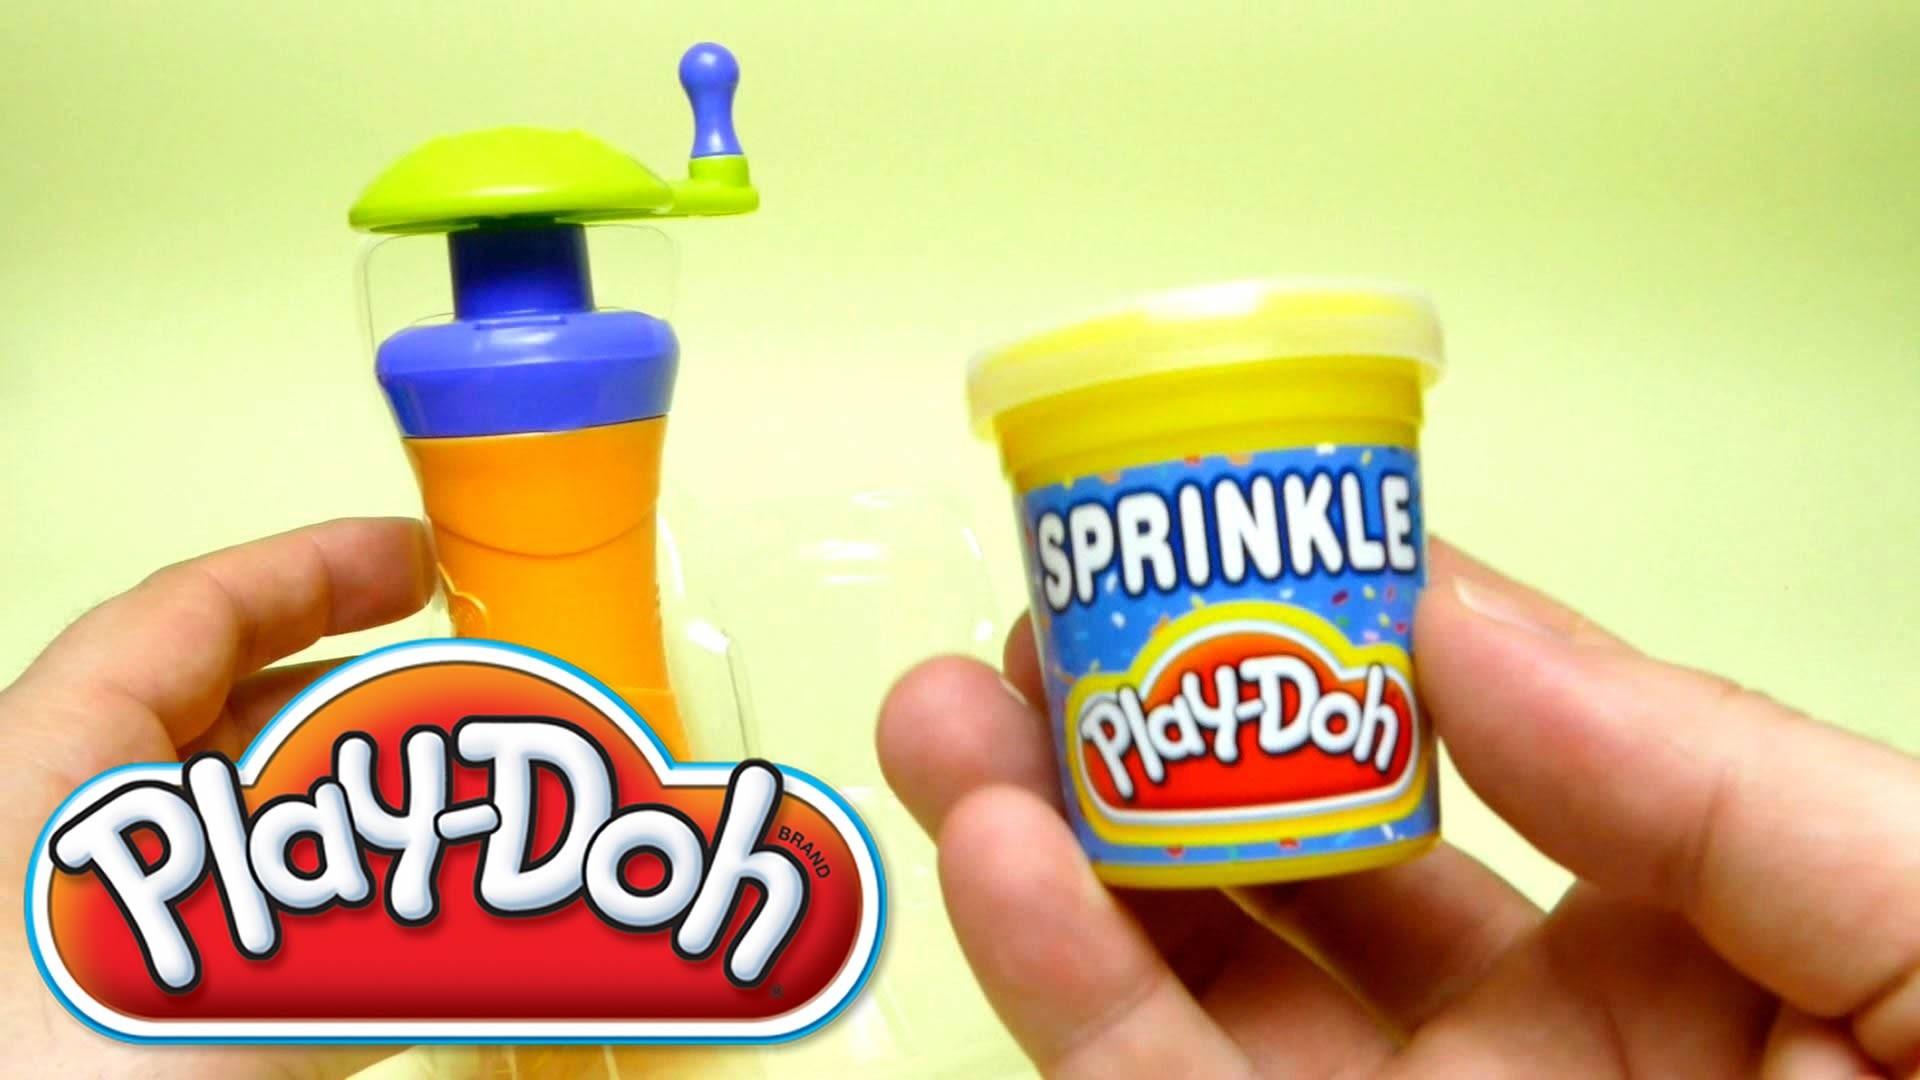 Play-Doh Super DIY Tools - Sprinkle Color Confetti Ice Cream Cup